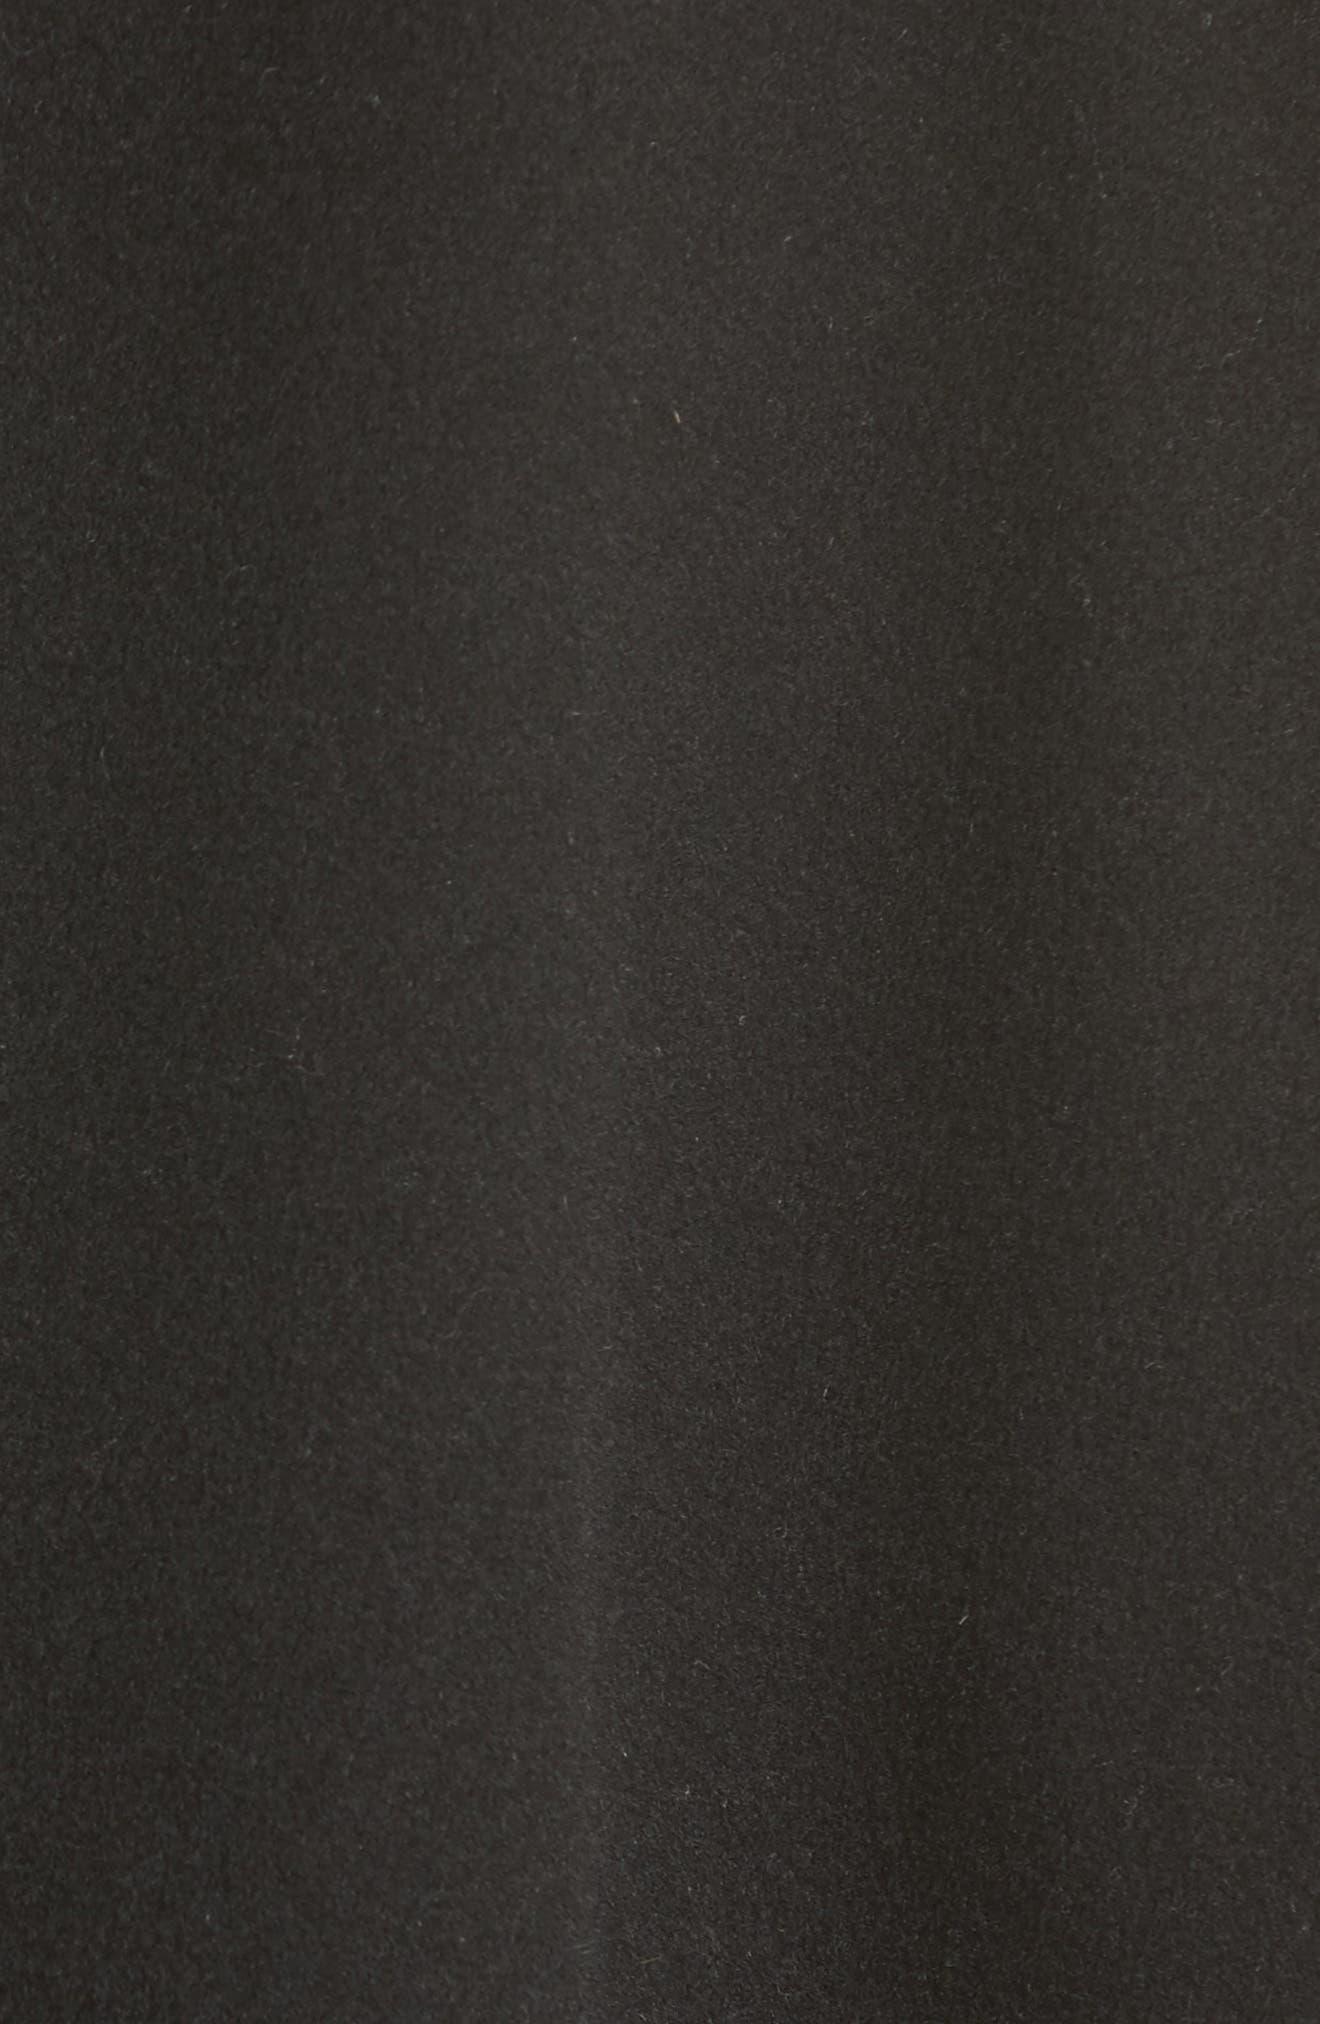 Reversible Wool & Cashmere Clutch Coat,                             Alternate thumbnail 6, color,                             006